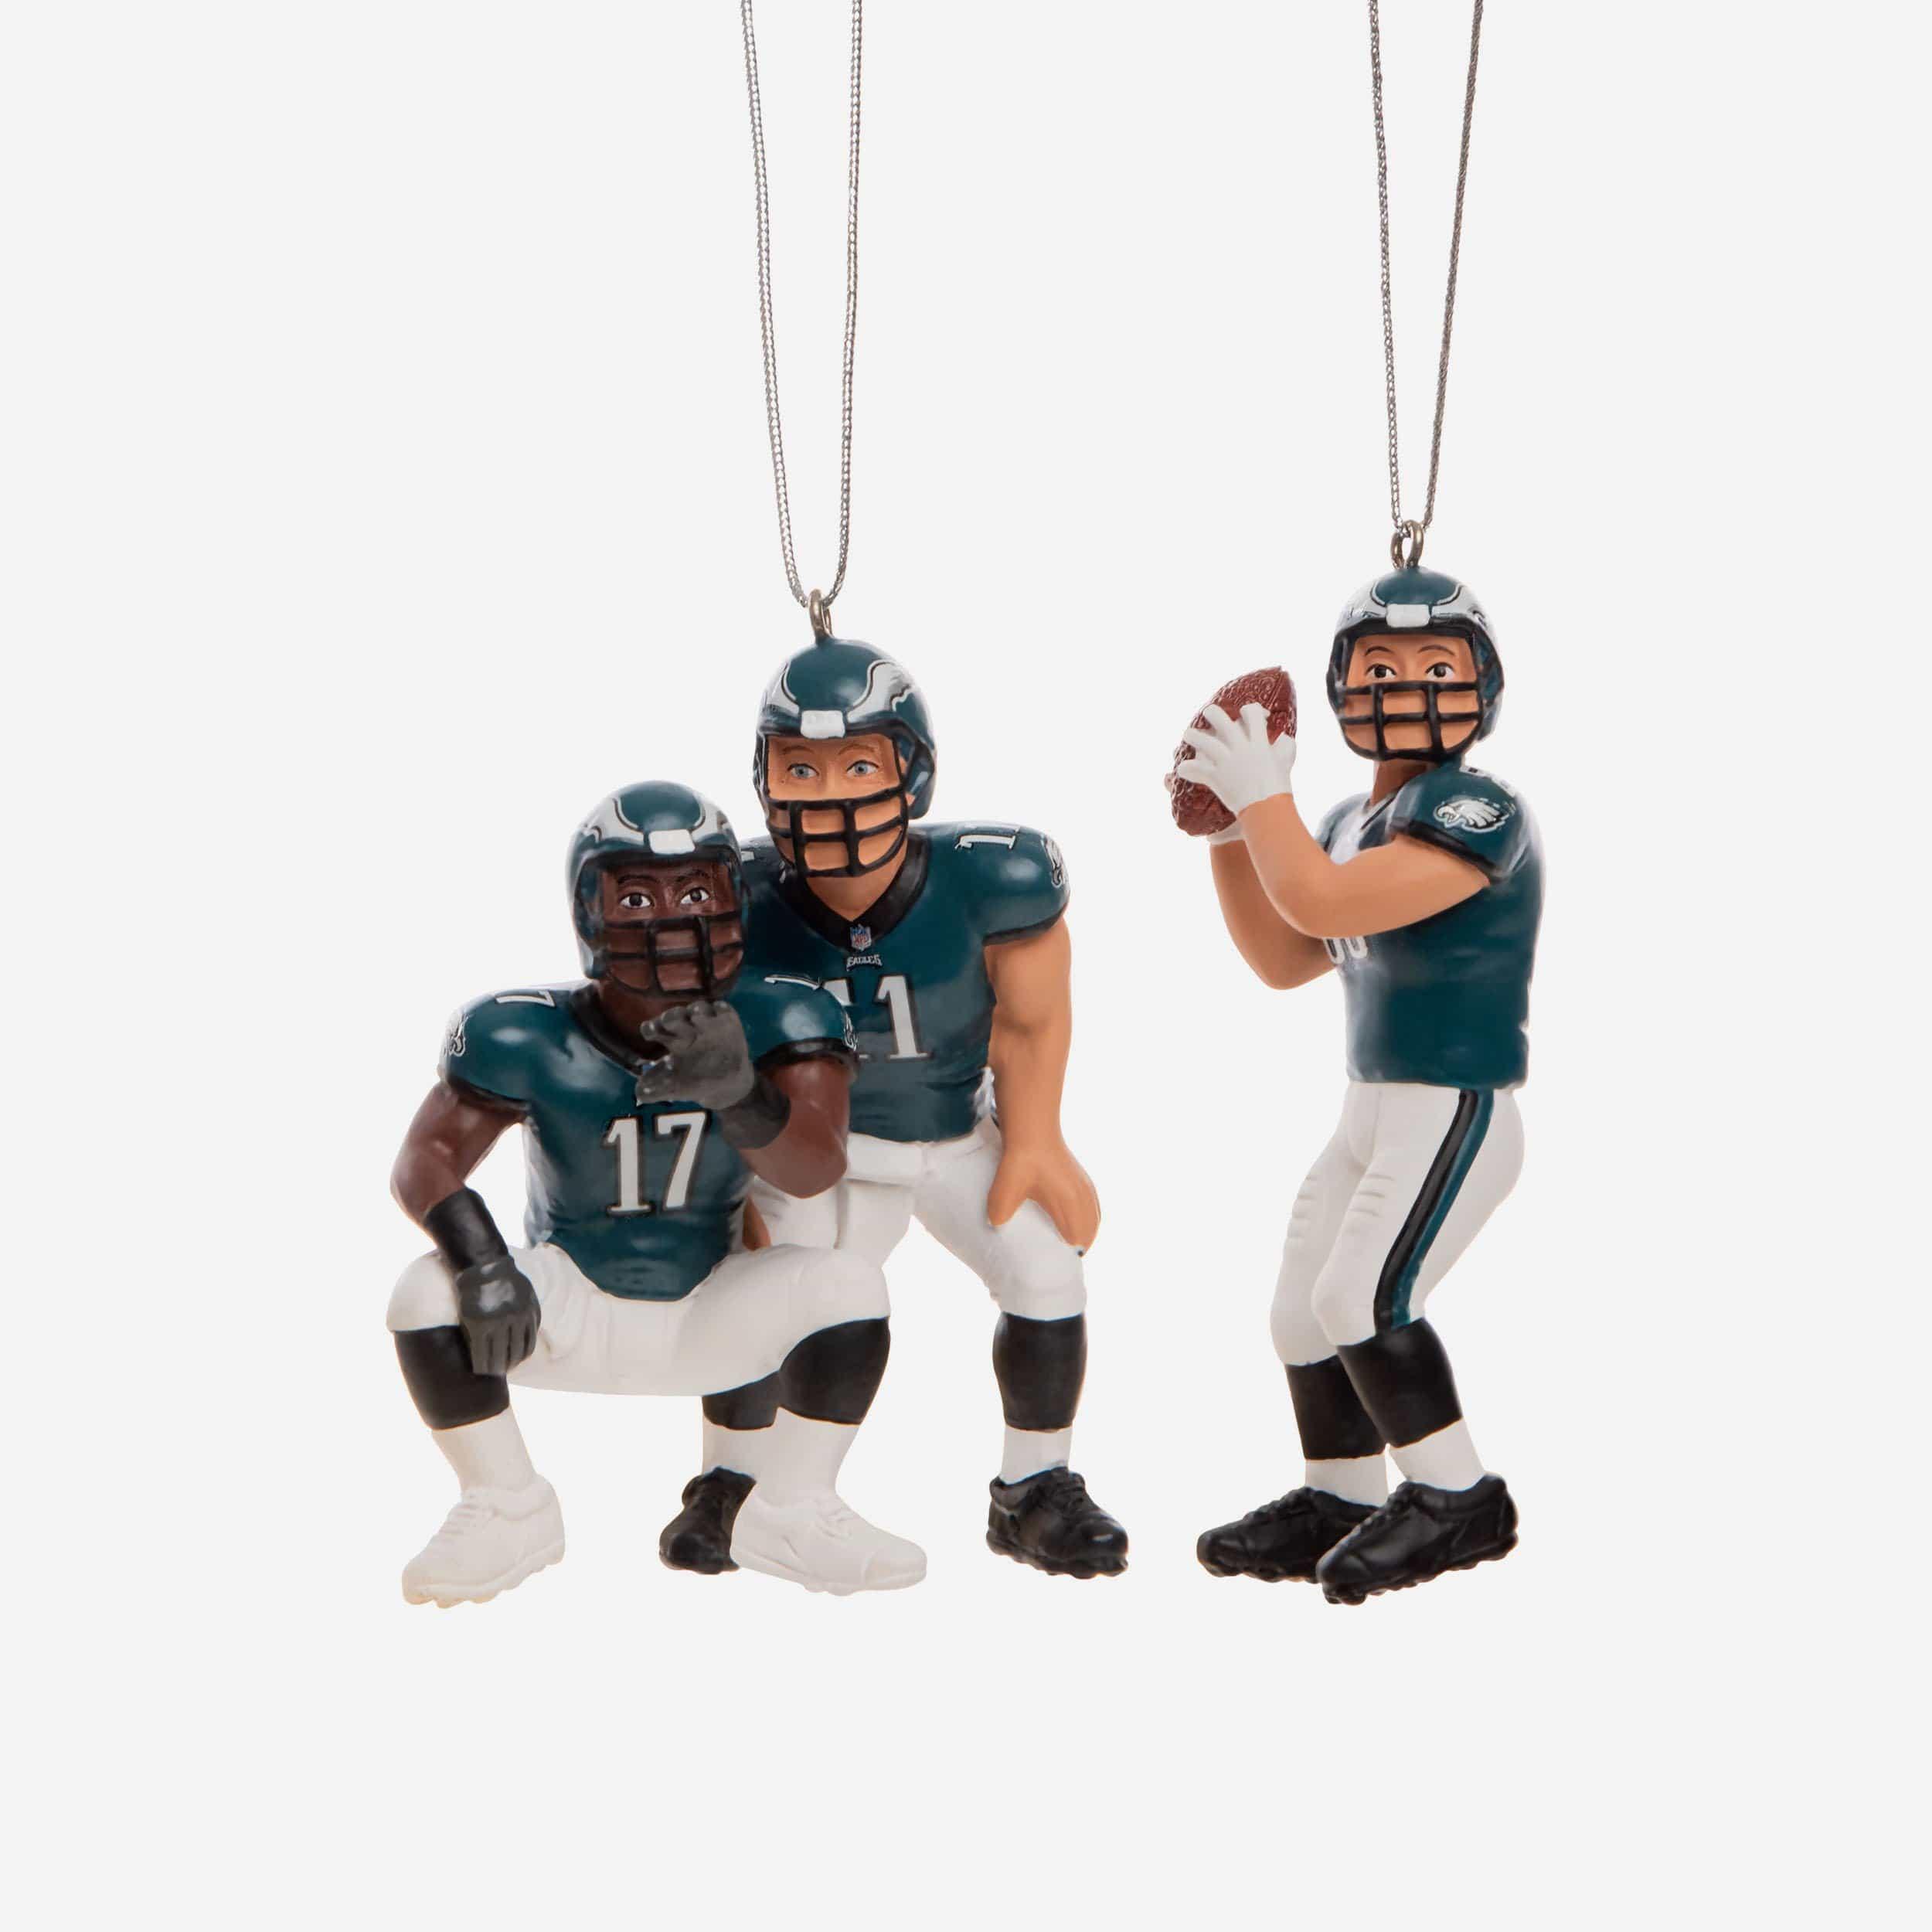 FOCO Philadelphia Eagles 3 Player Team Celebration Ornament